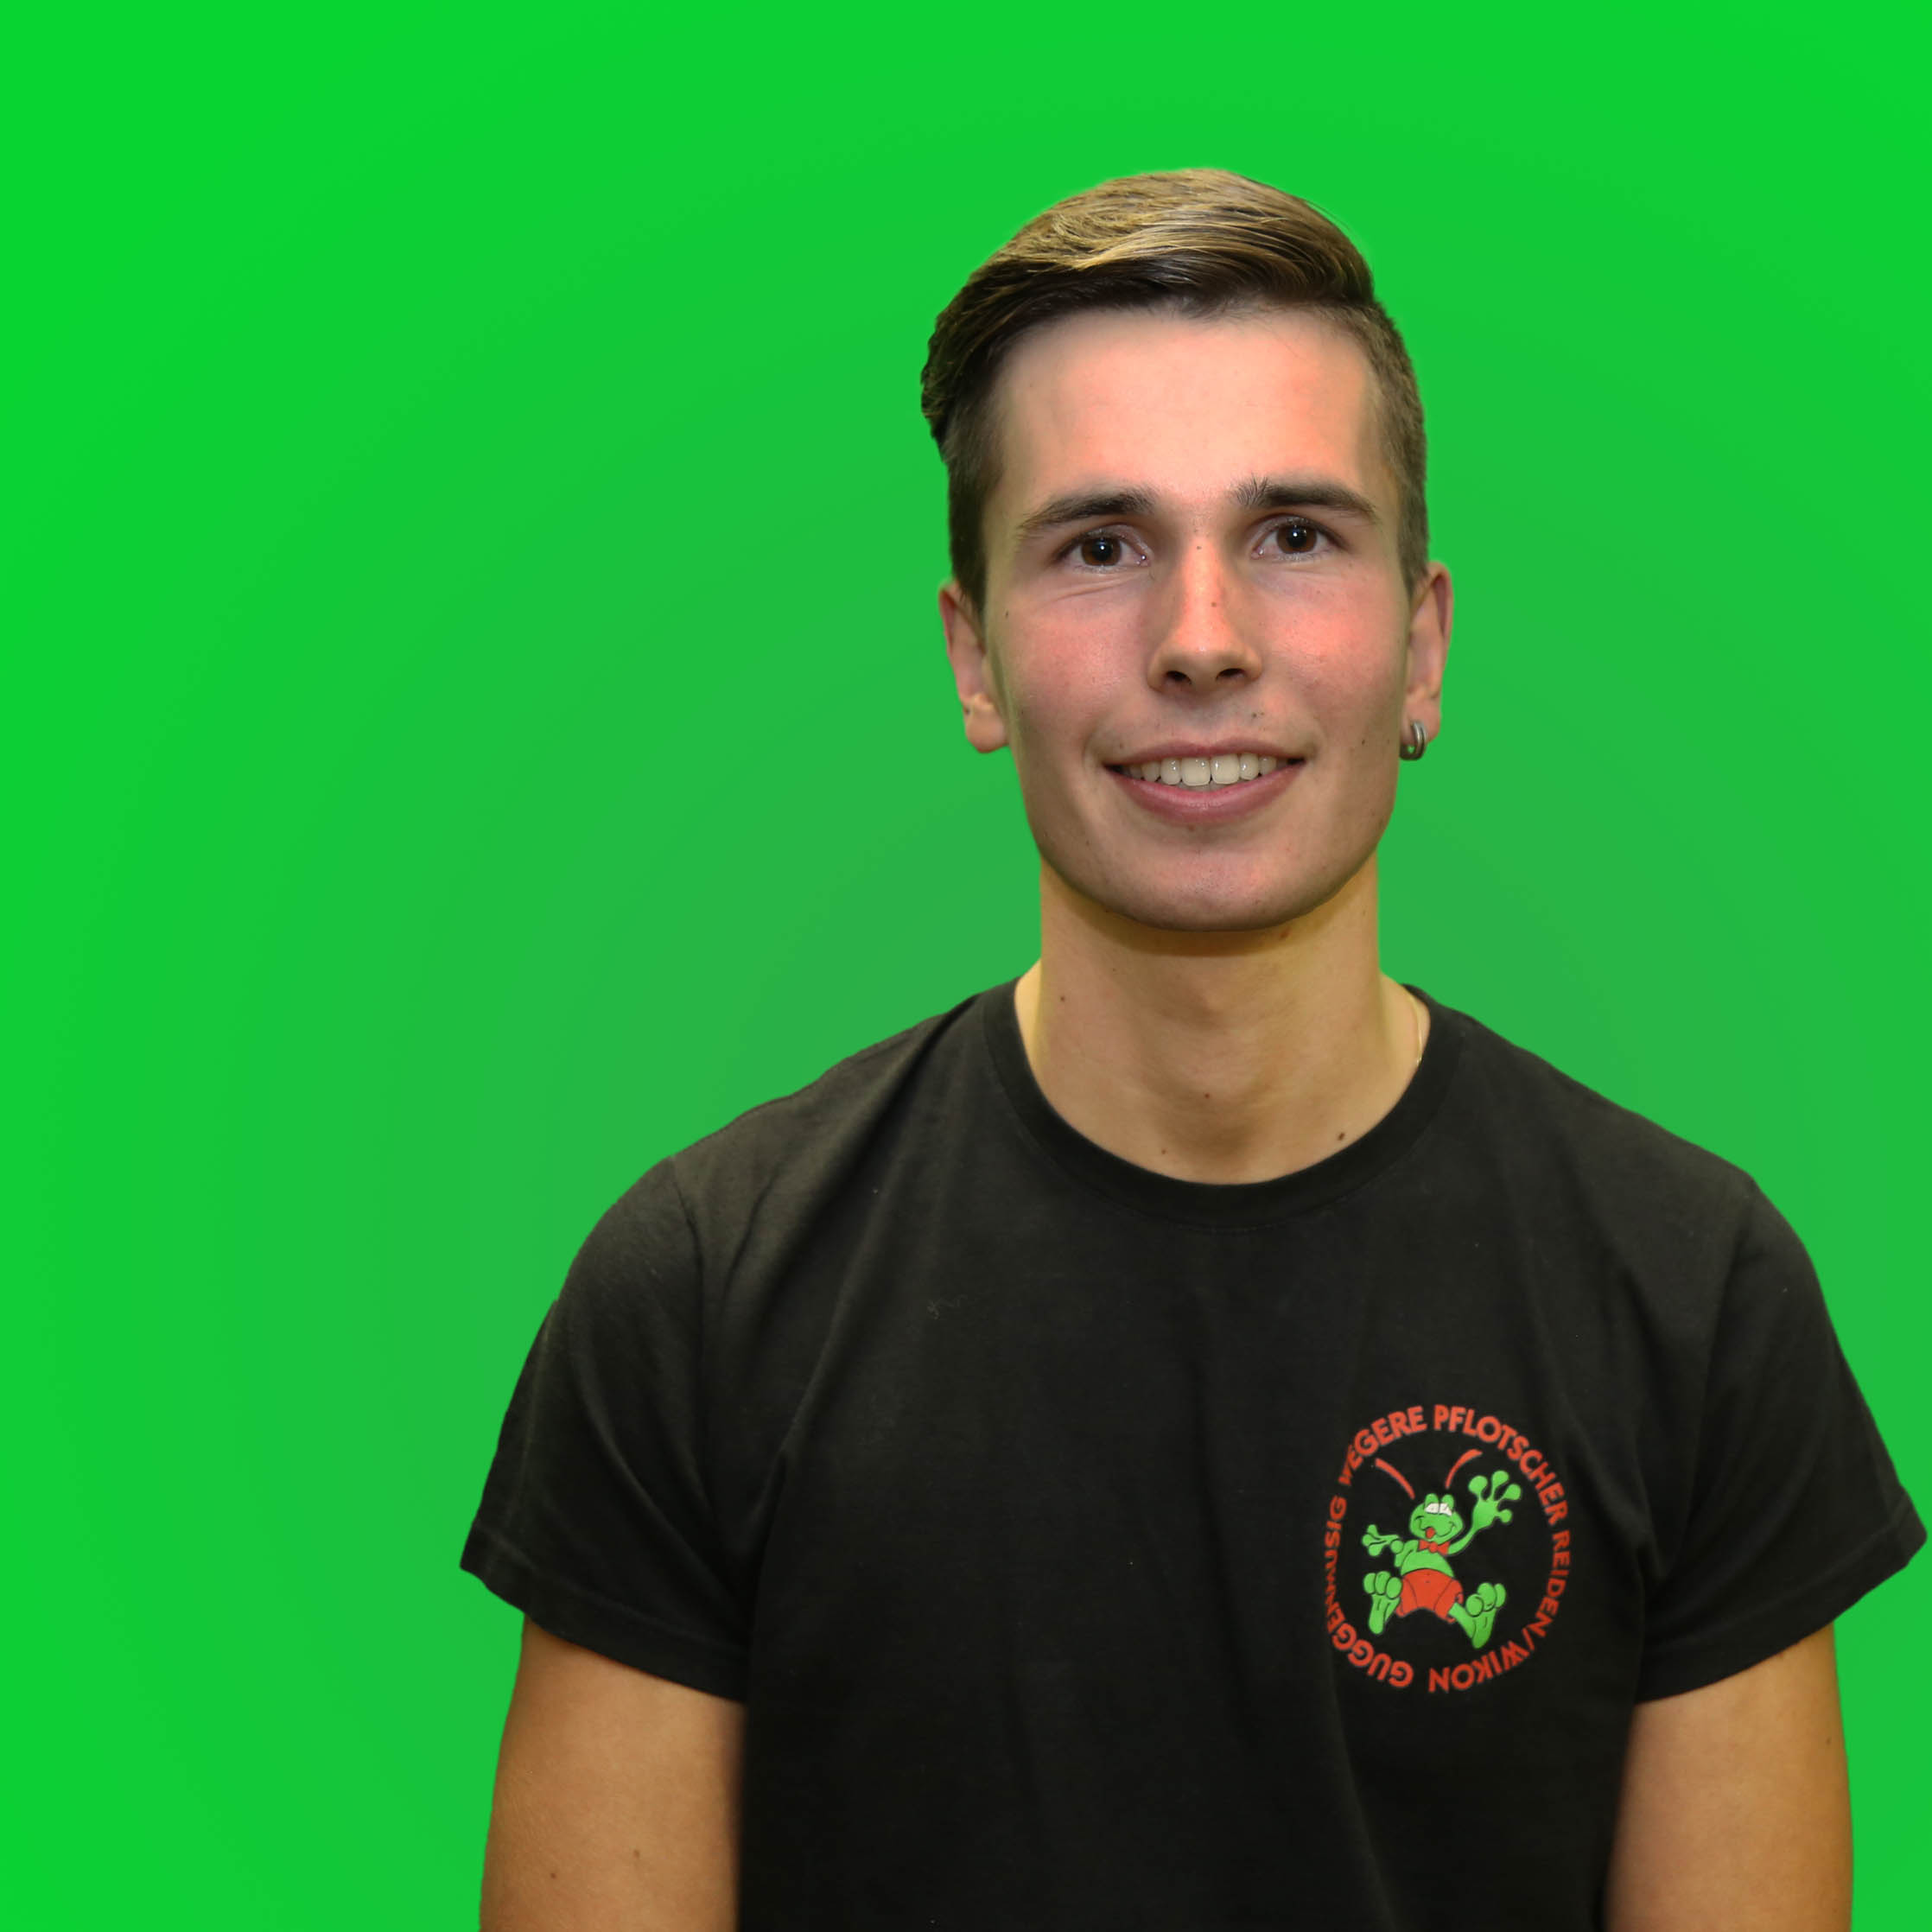 Flavio Bühler